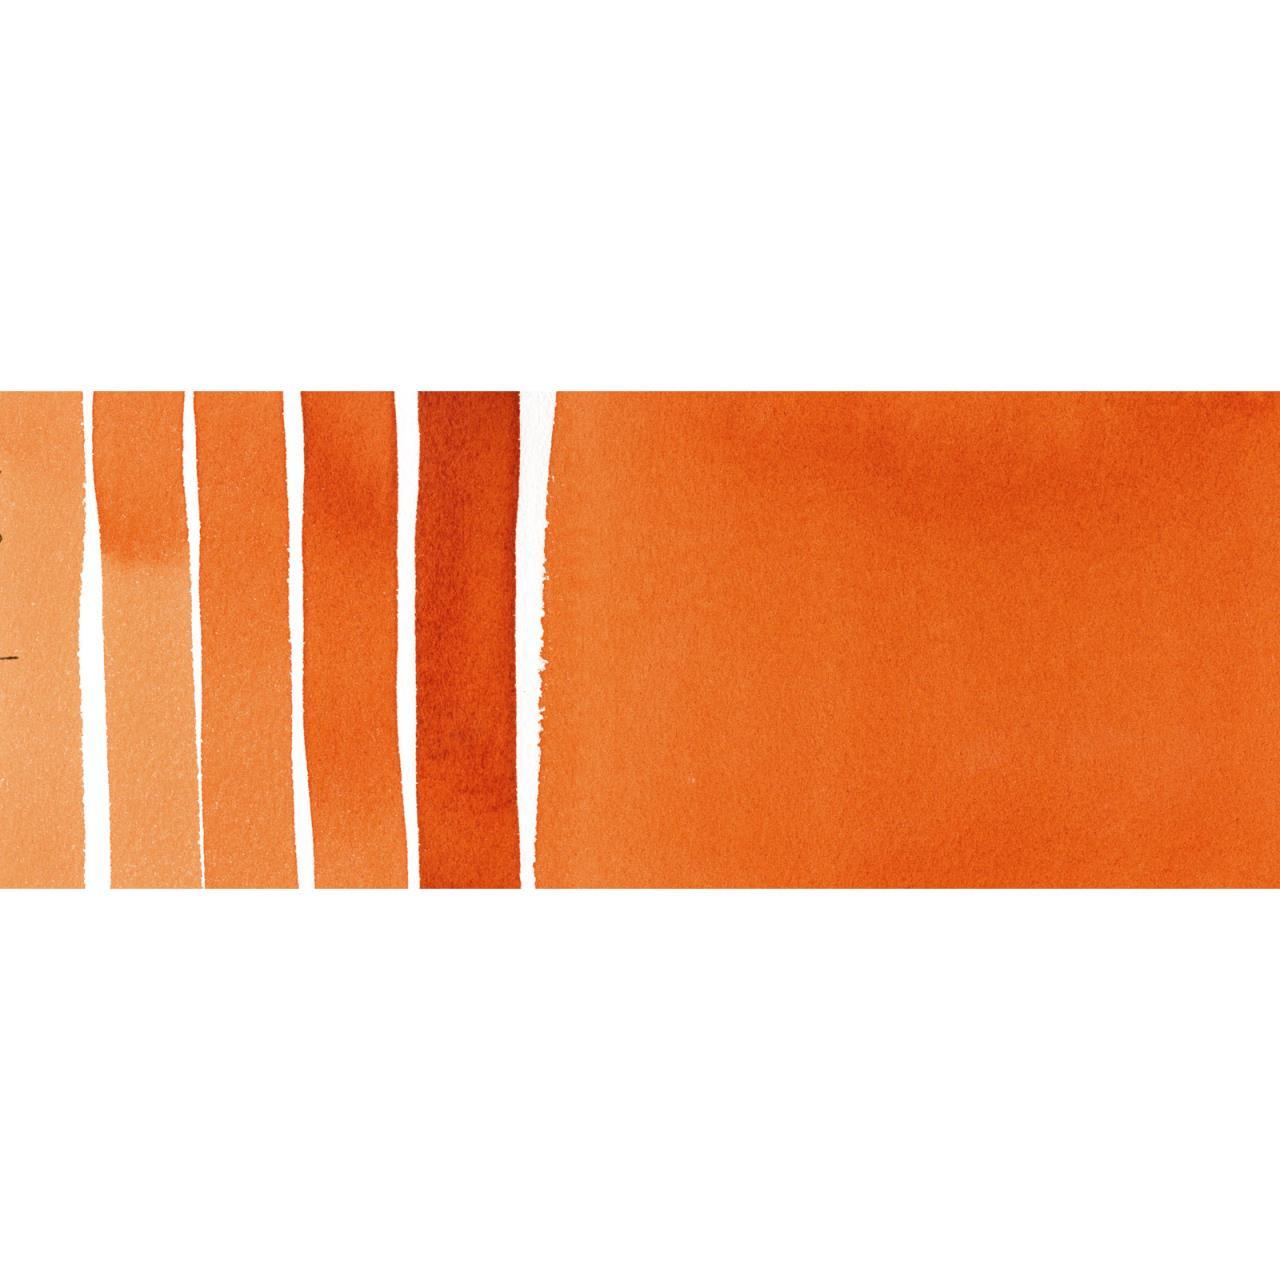 Quinacridone Sienna, DANIEL SMITH Extra Fine Watercolors 5ml Tubes -